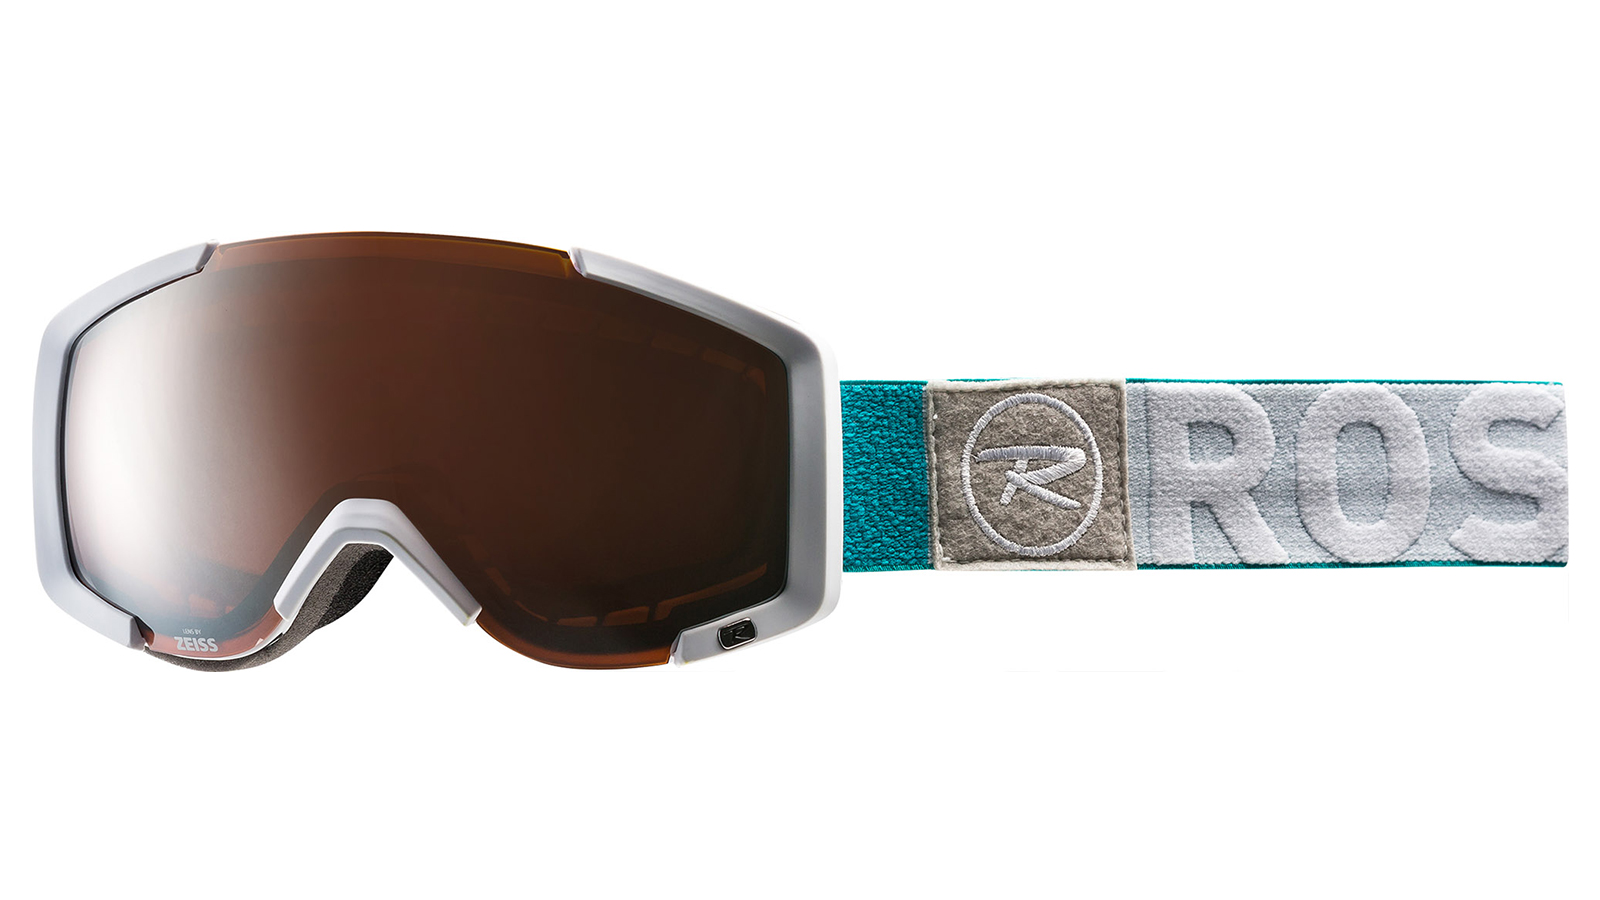 Rossingnol-Airis-Sonar-Goggle